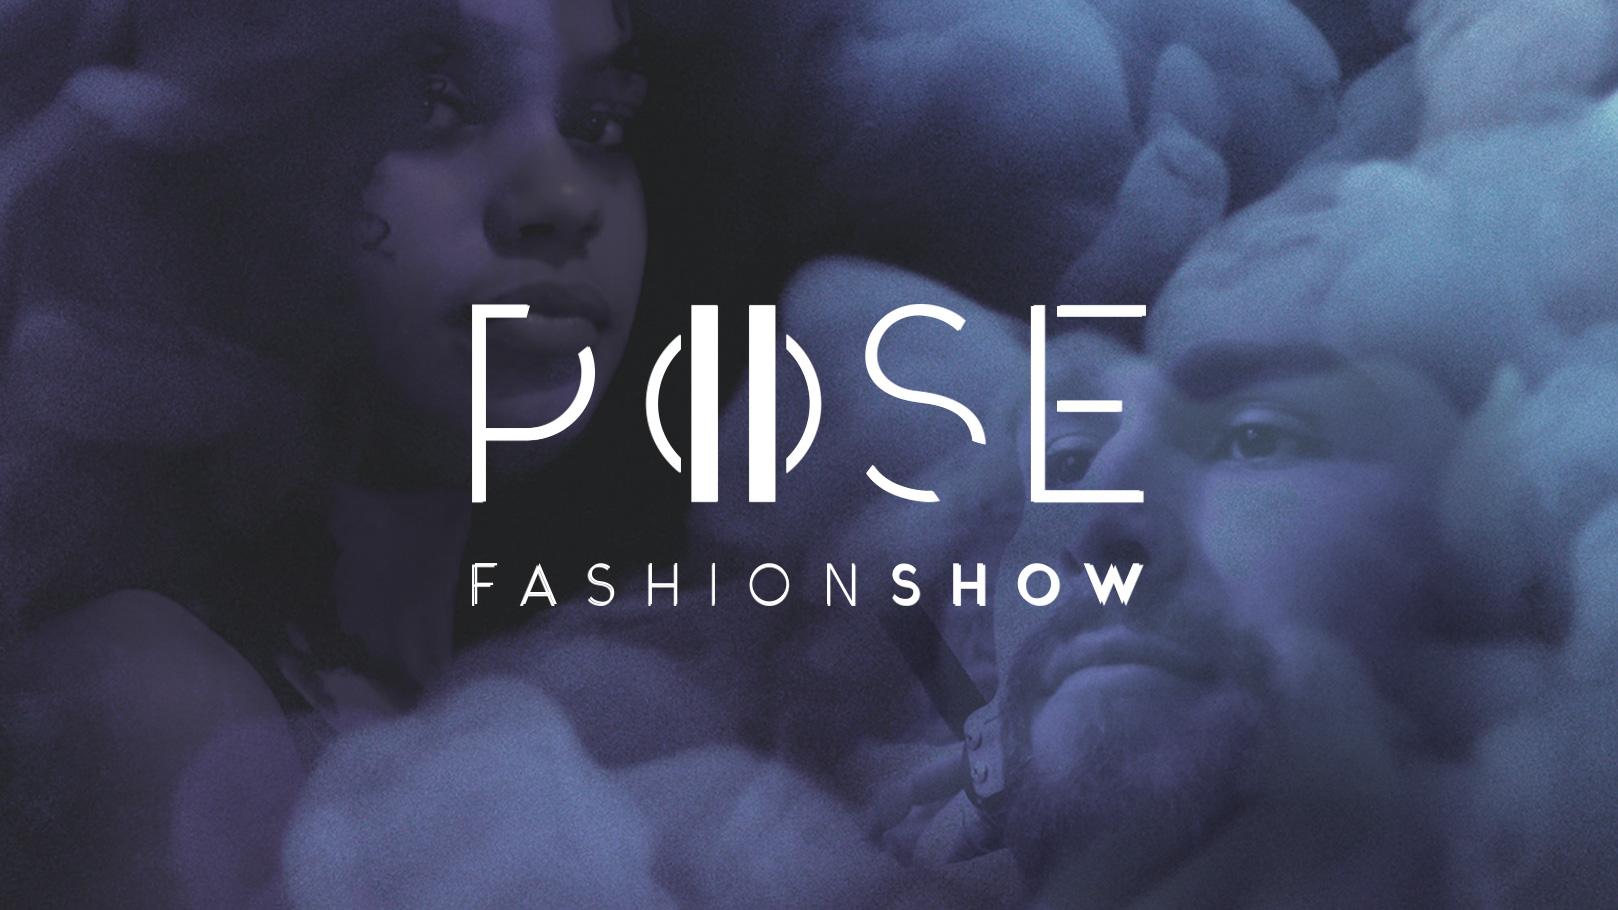 unik-pose-FSA_fashionshow